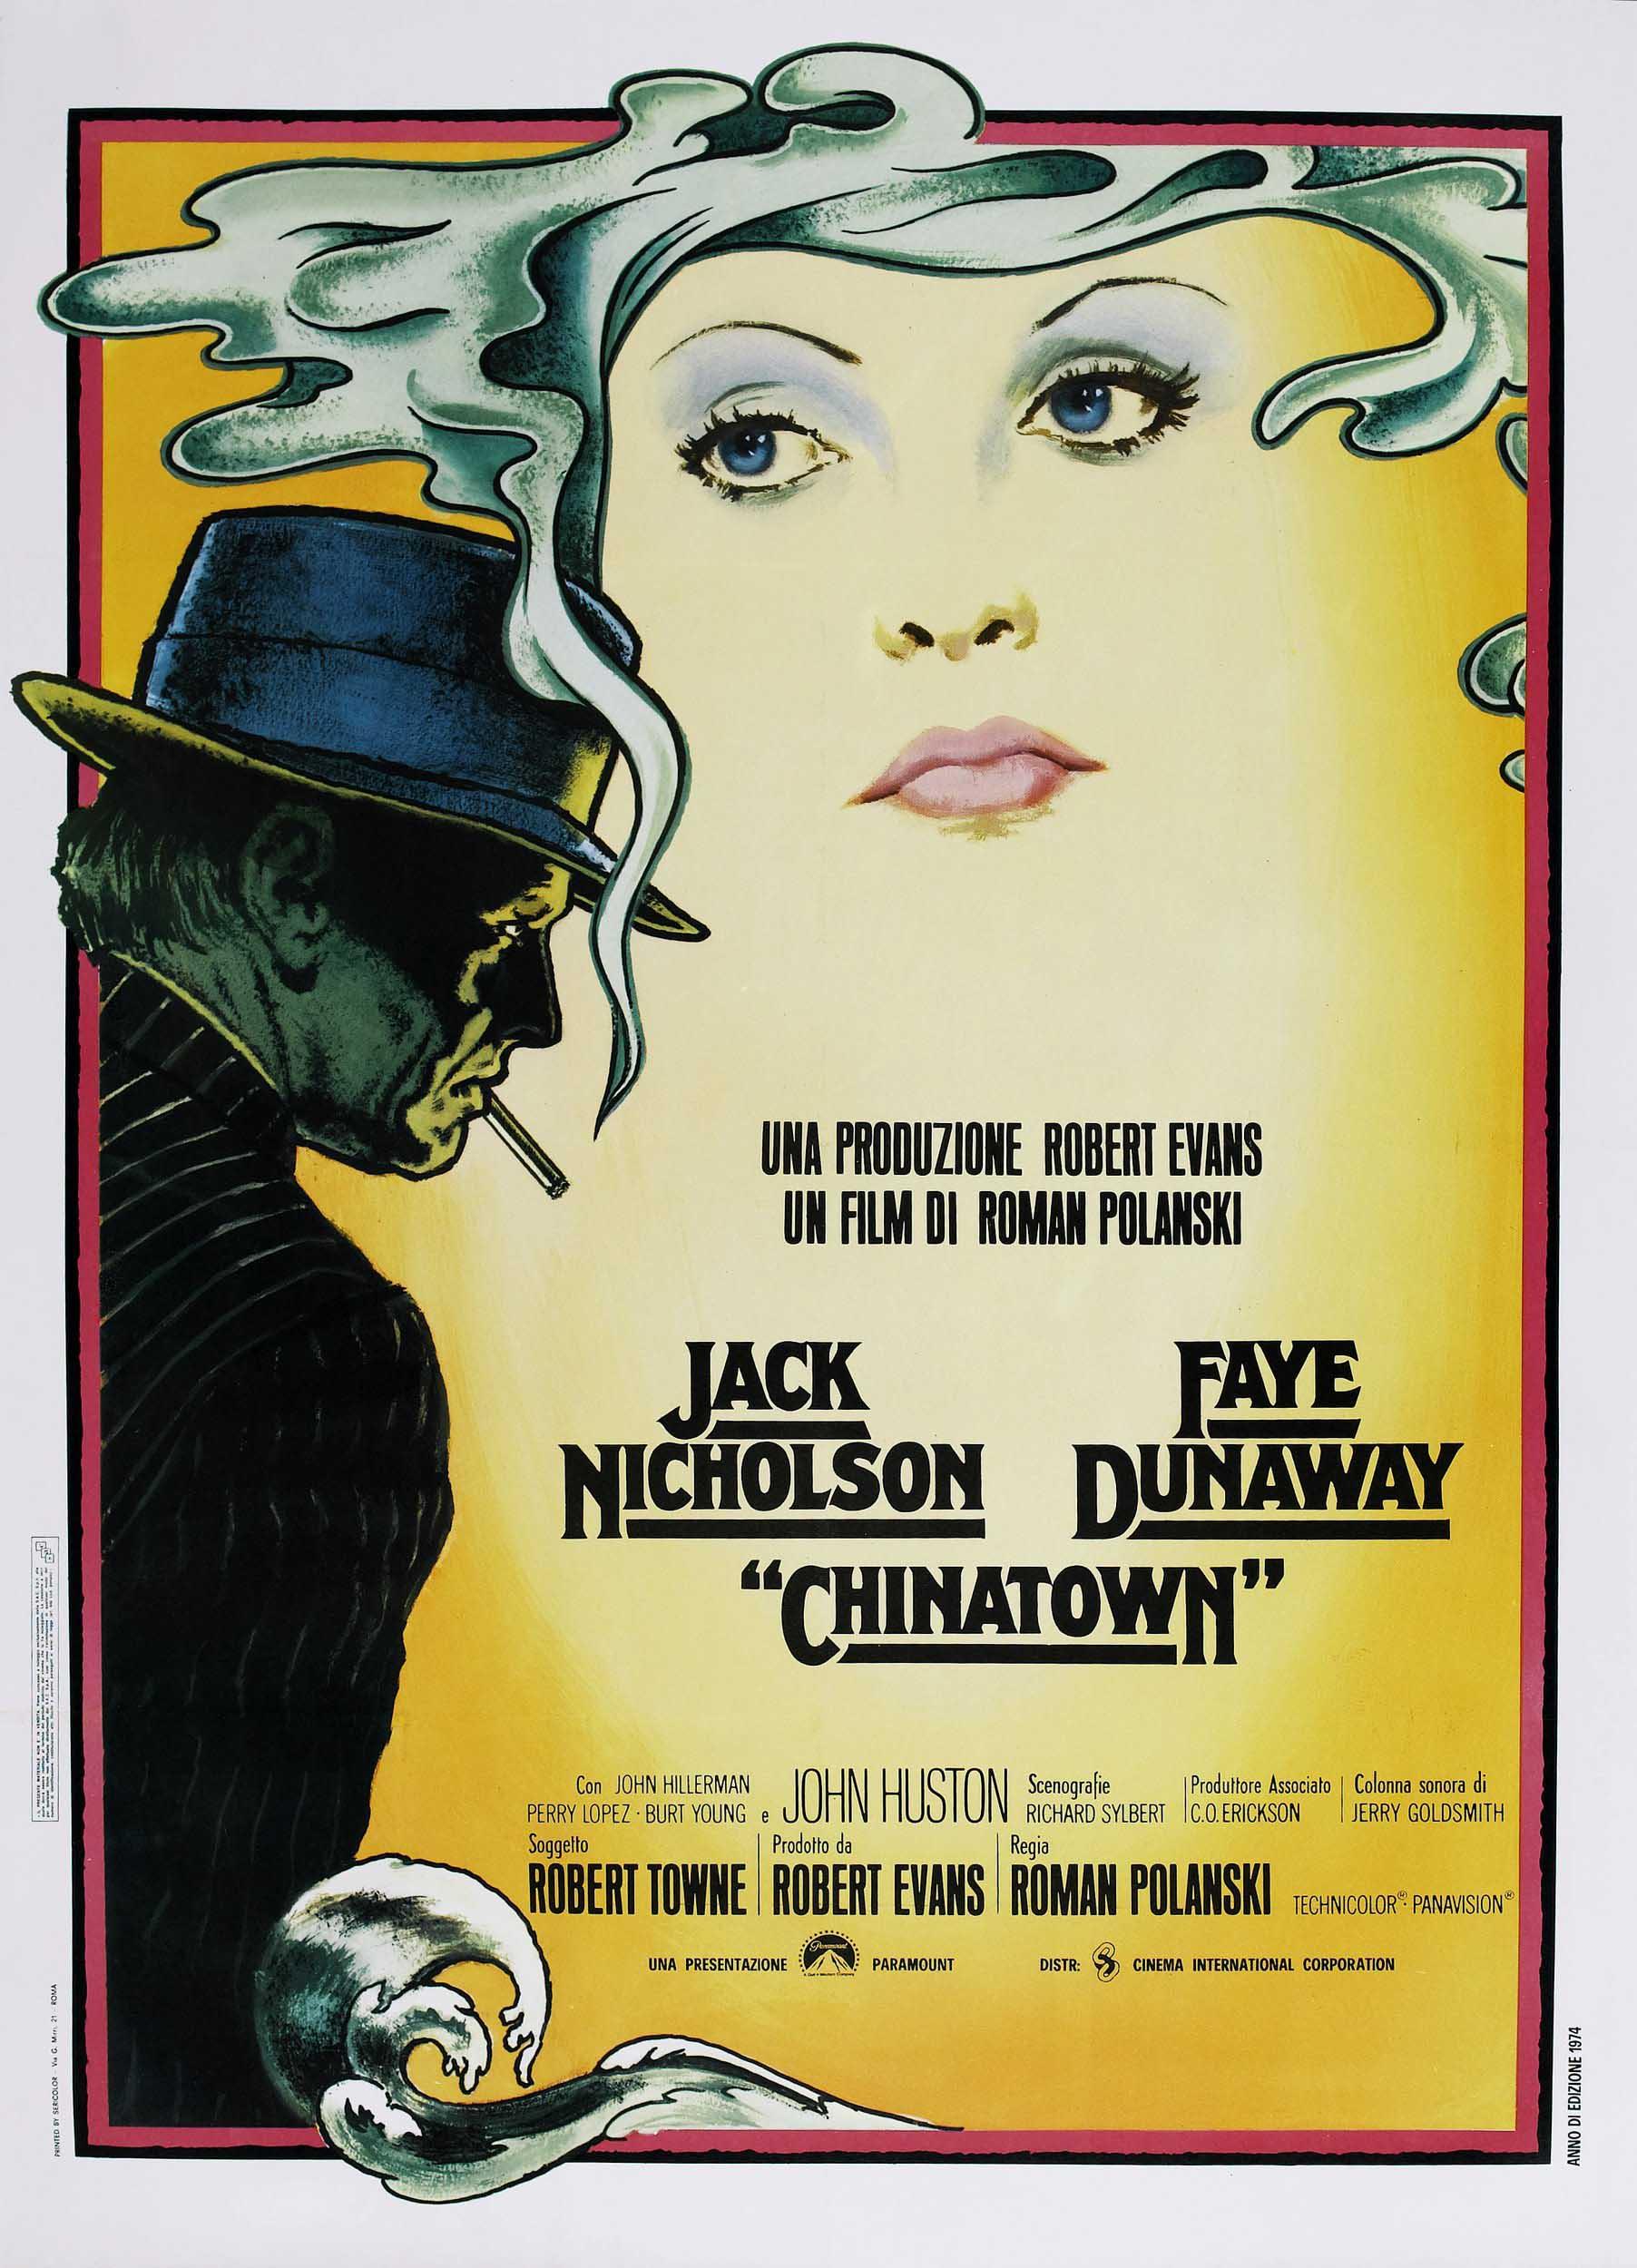 film-noir-chinatown-1974-movie-poster-via-professormortis-wordpress.jpg